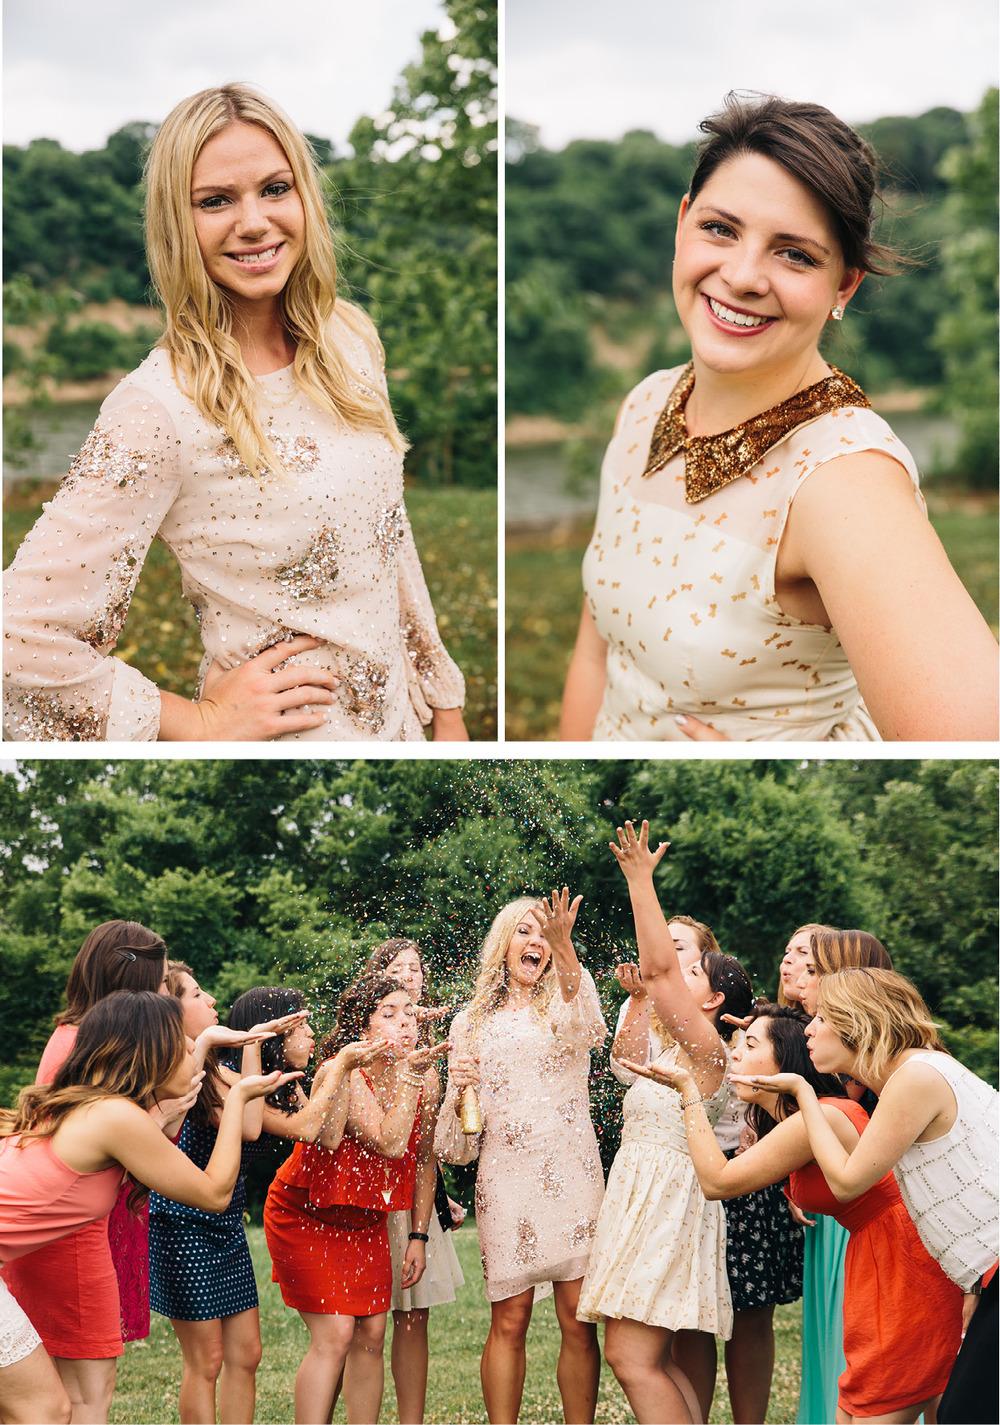 CK-Photo-Nashville-Wedding-Lifestyle-Photographer-cw8.jpg